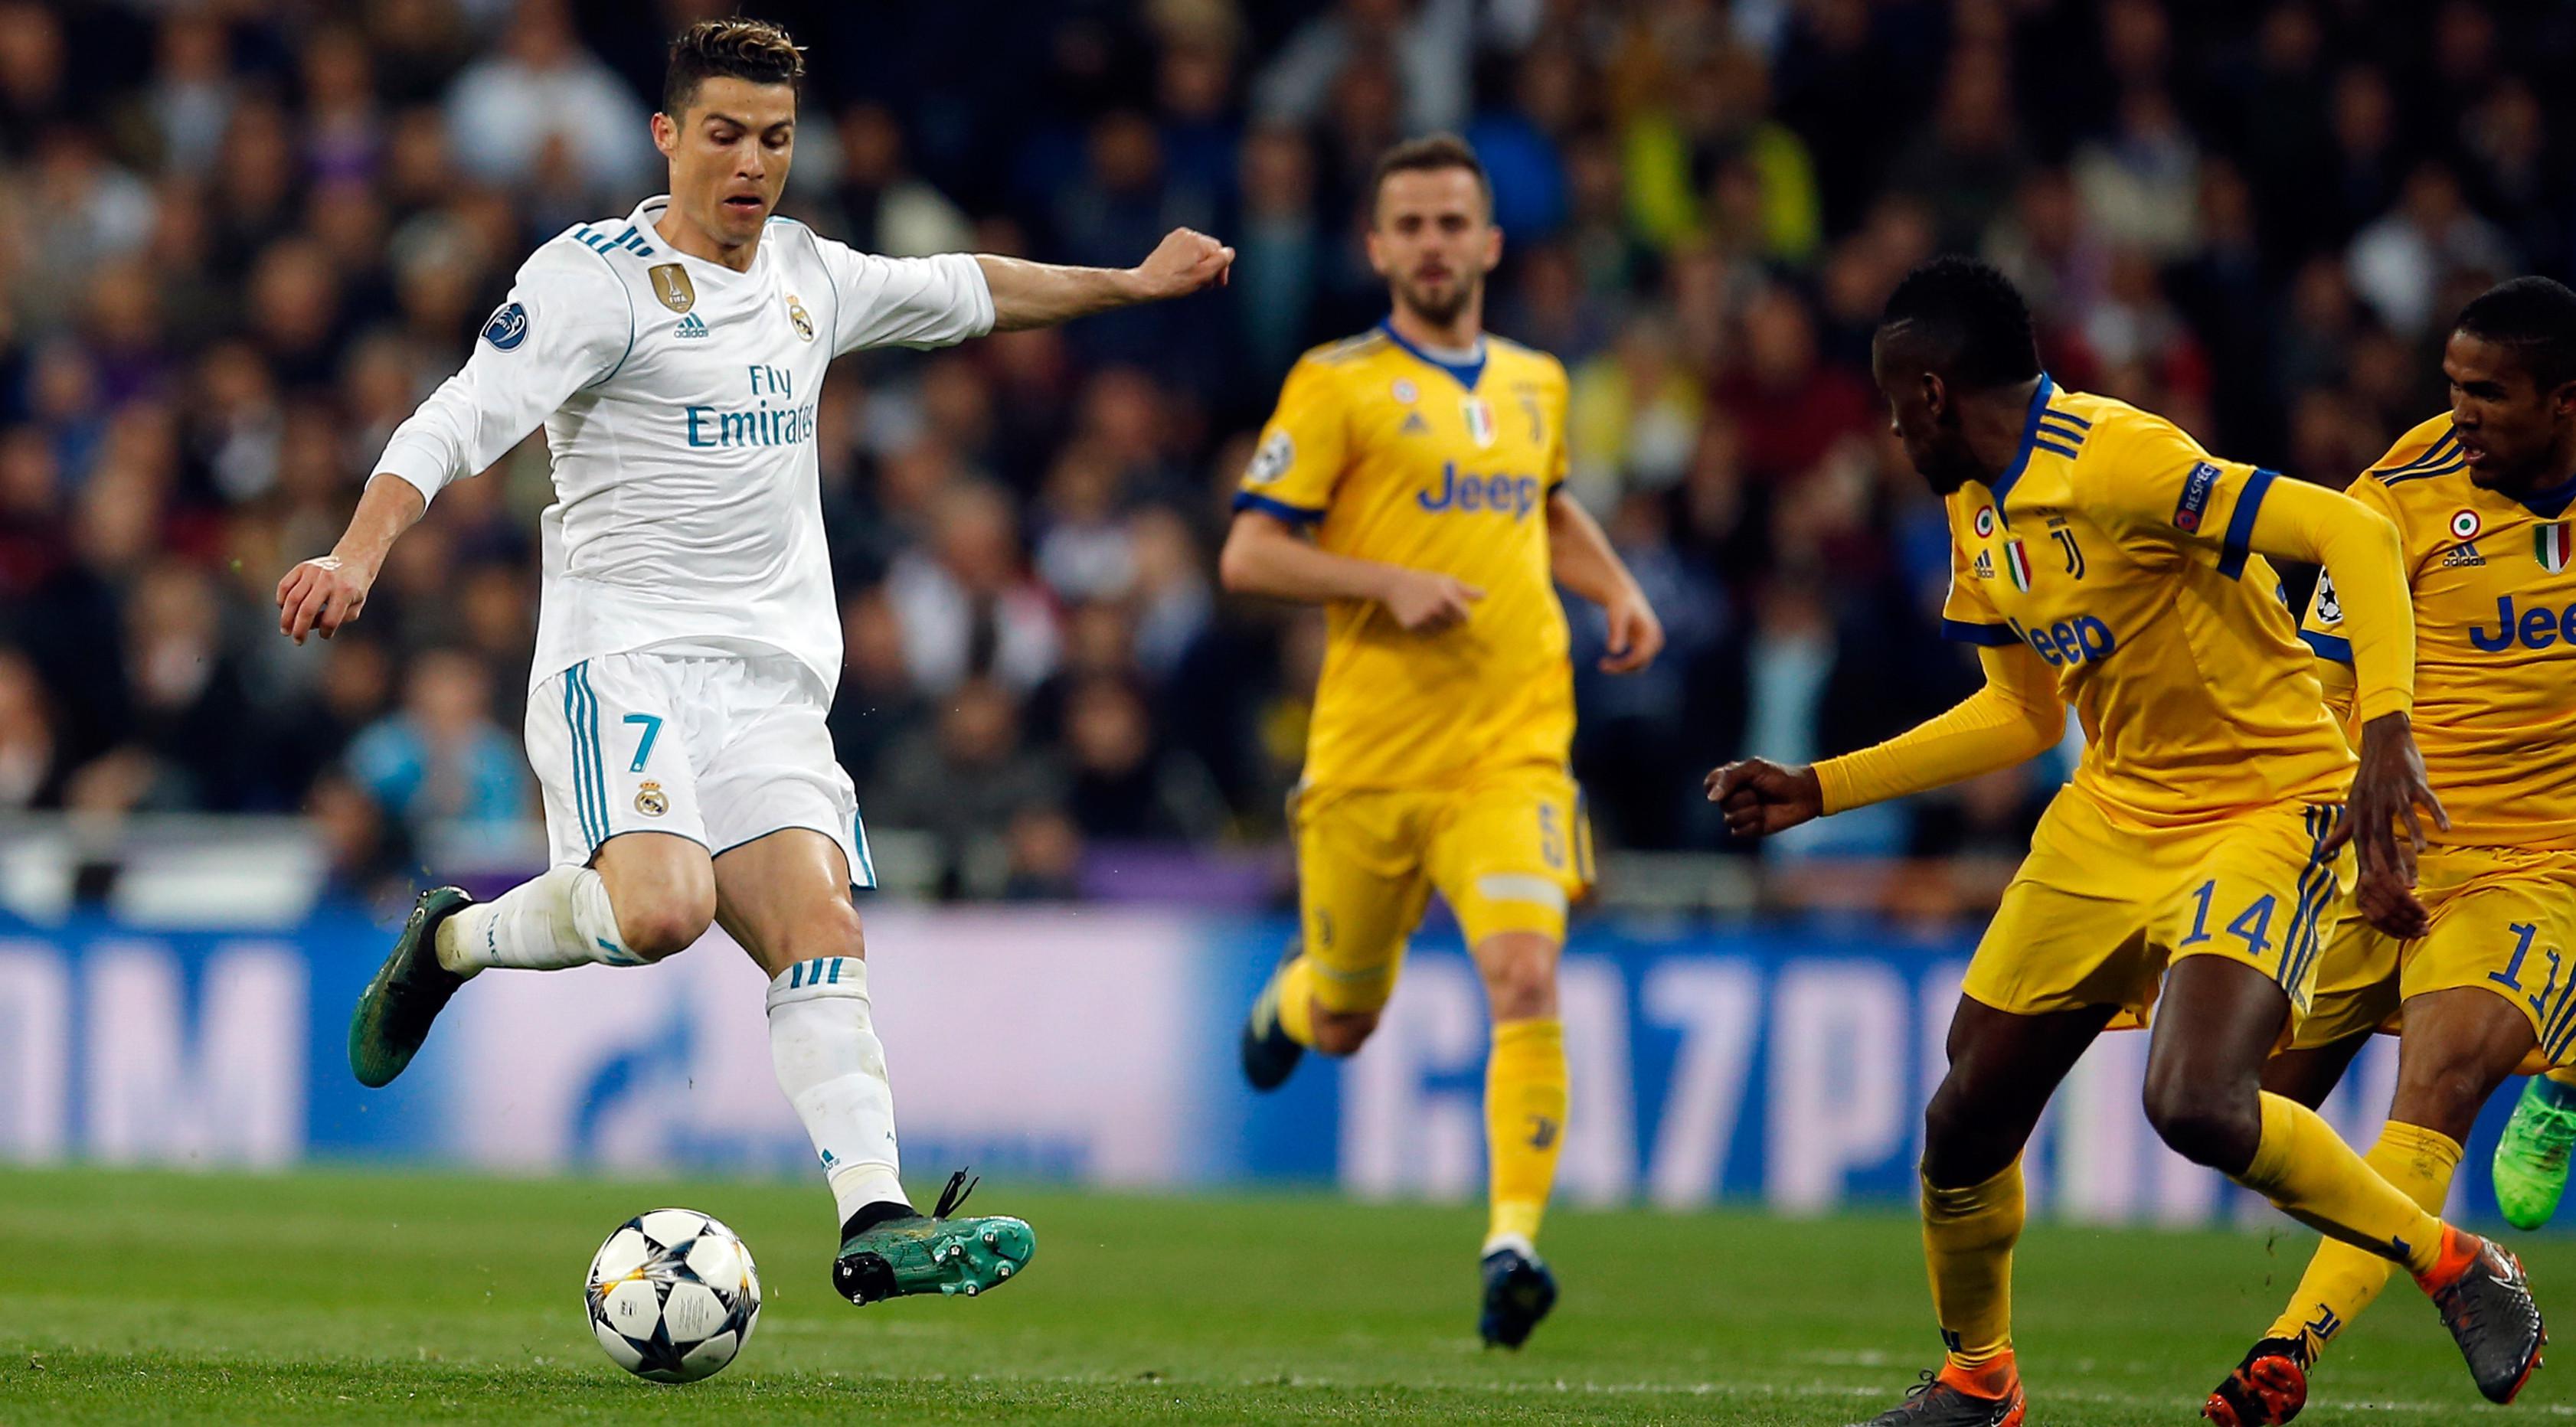 Pemain Real Madrid, Cristiano Ronaldo menendang bola dengan dibayangi pemain Juventus pada leg kedua babak perempat final Liga Champions di Santiago Bernabeu, Rabu (11/4) (AP/Paul White)